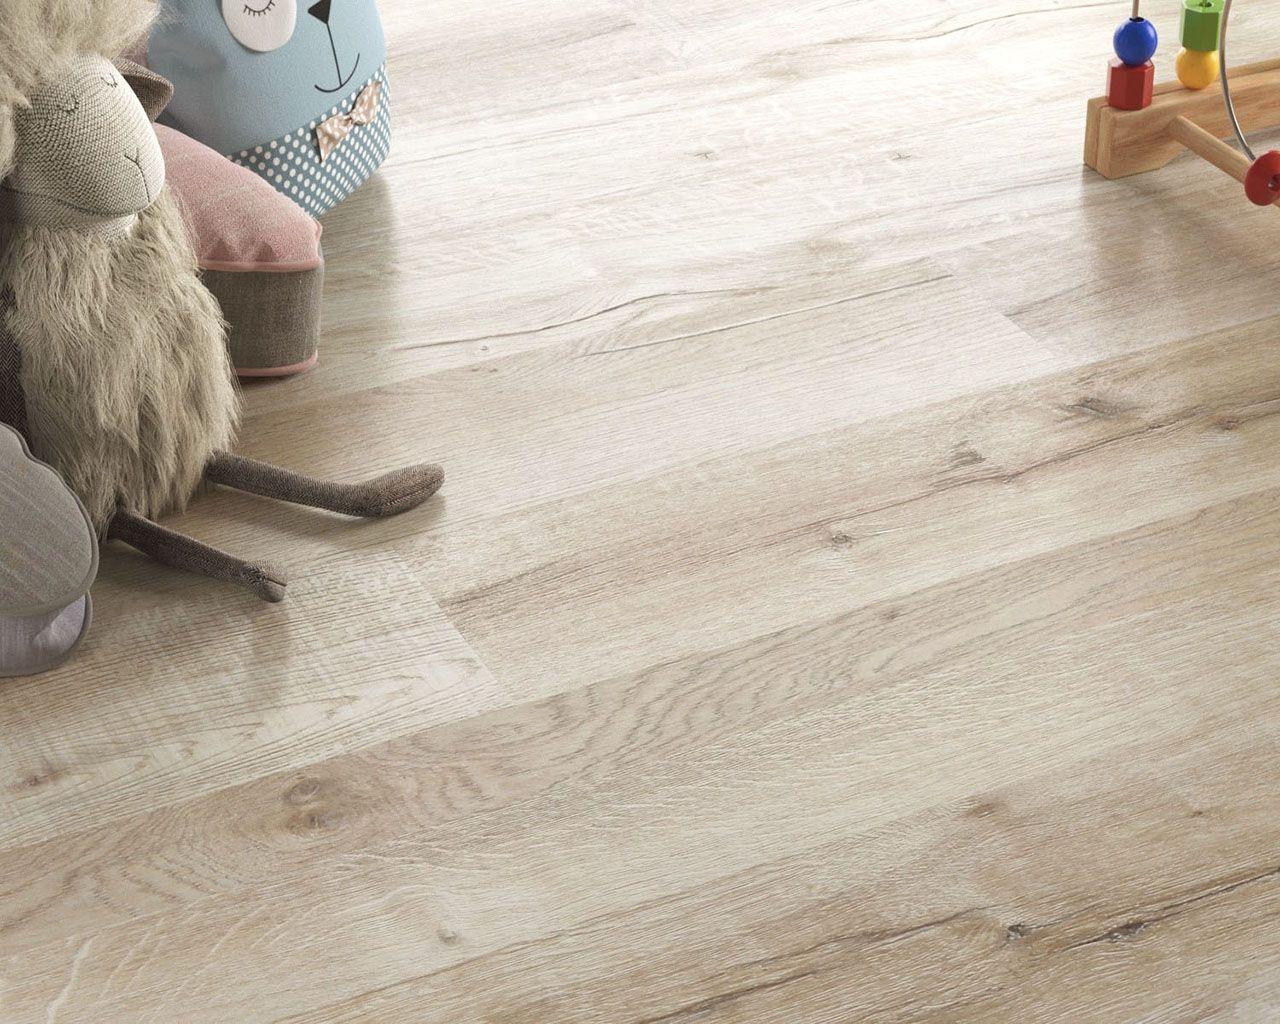 Maxifloor Sense Beige 5 5 Mm Waterproof Floor Waterproof